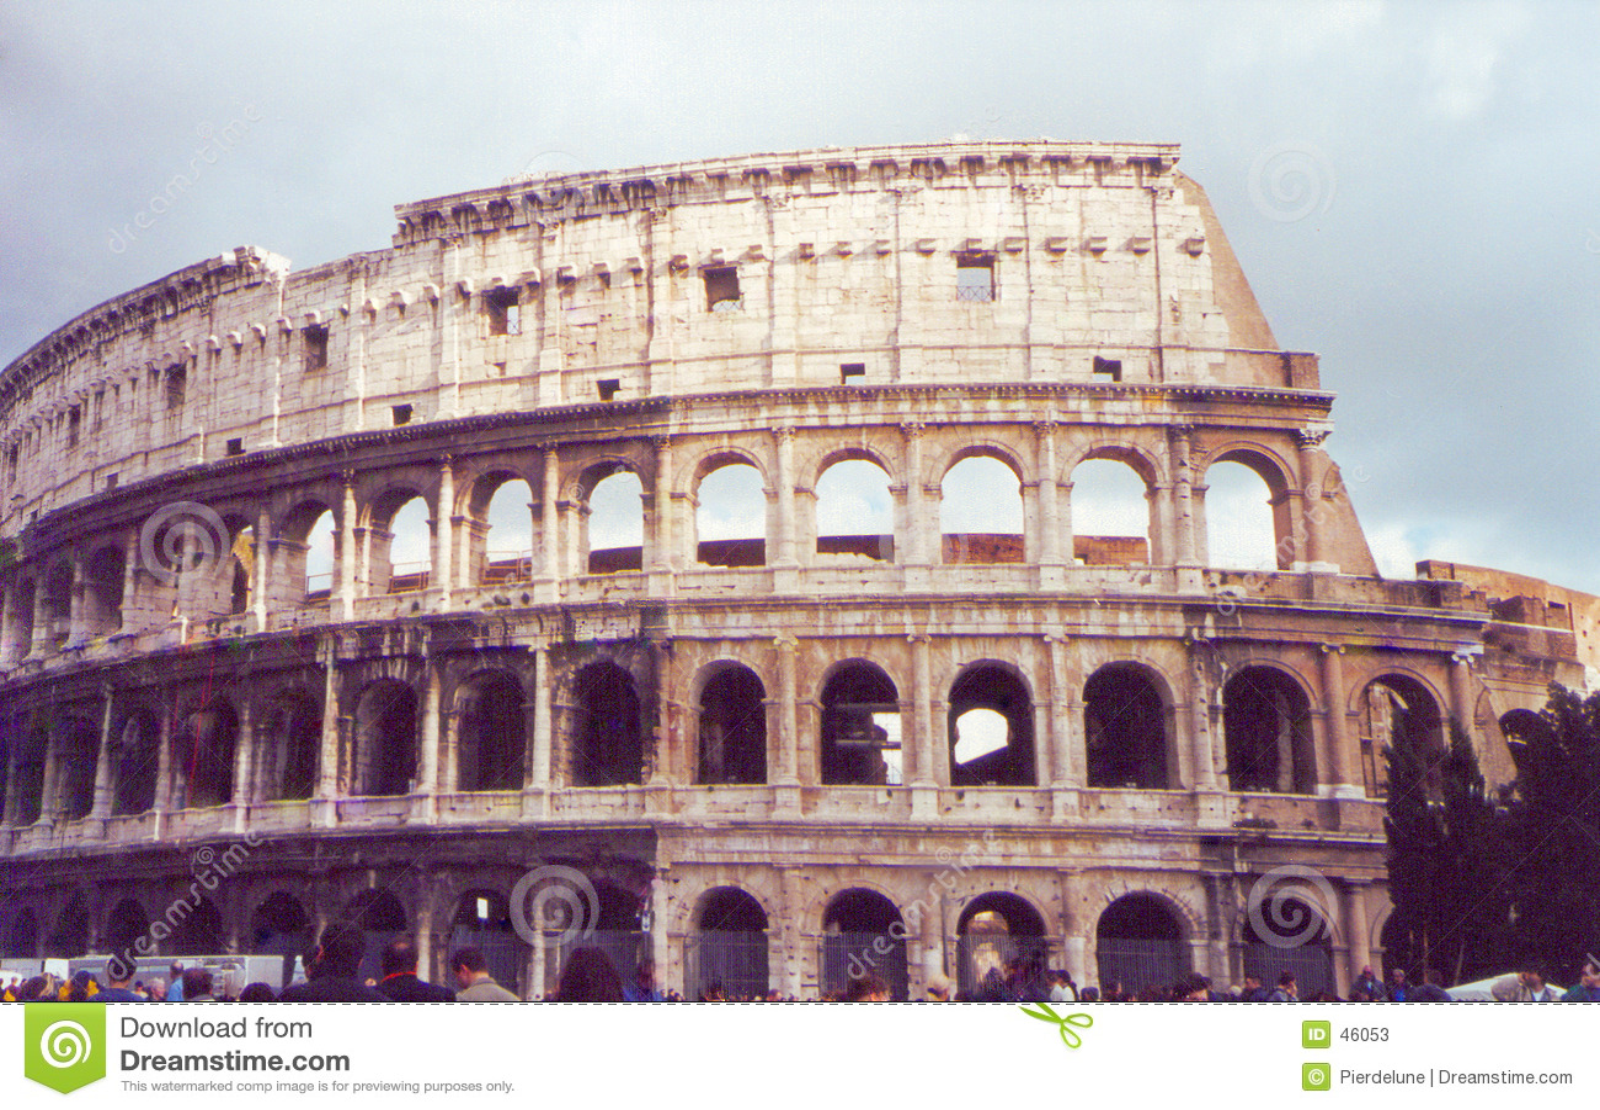 Colosseum Roma Italy